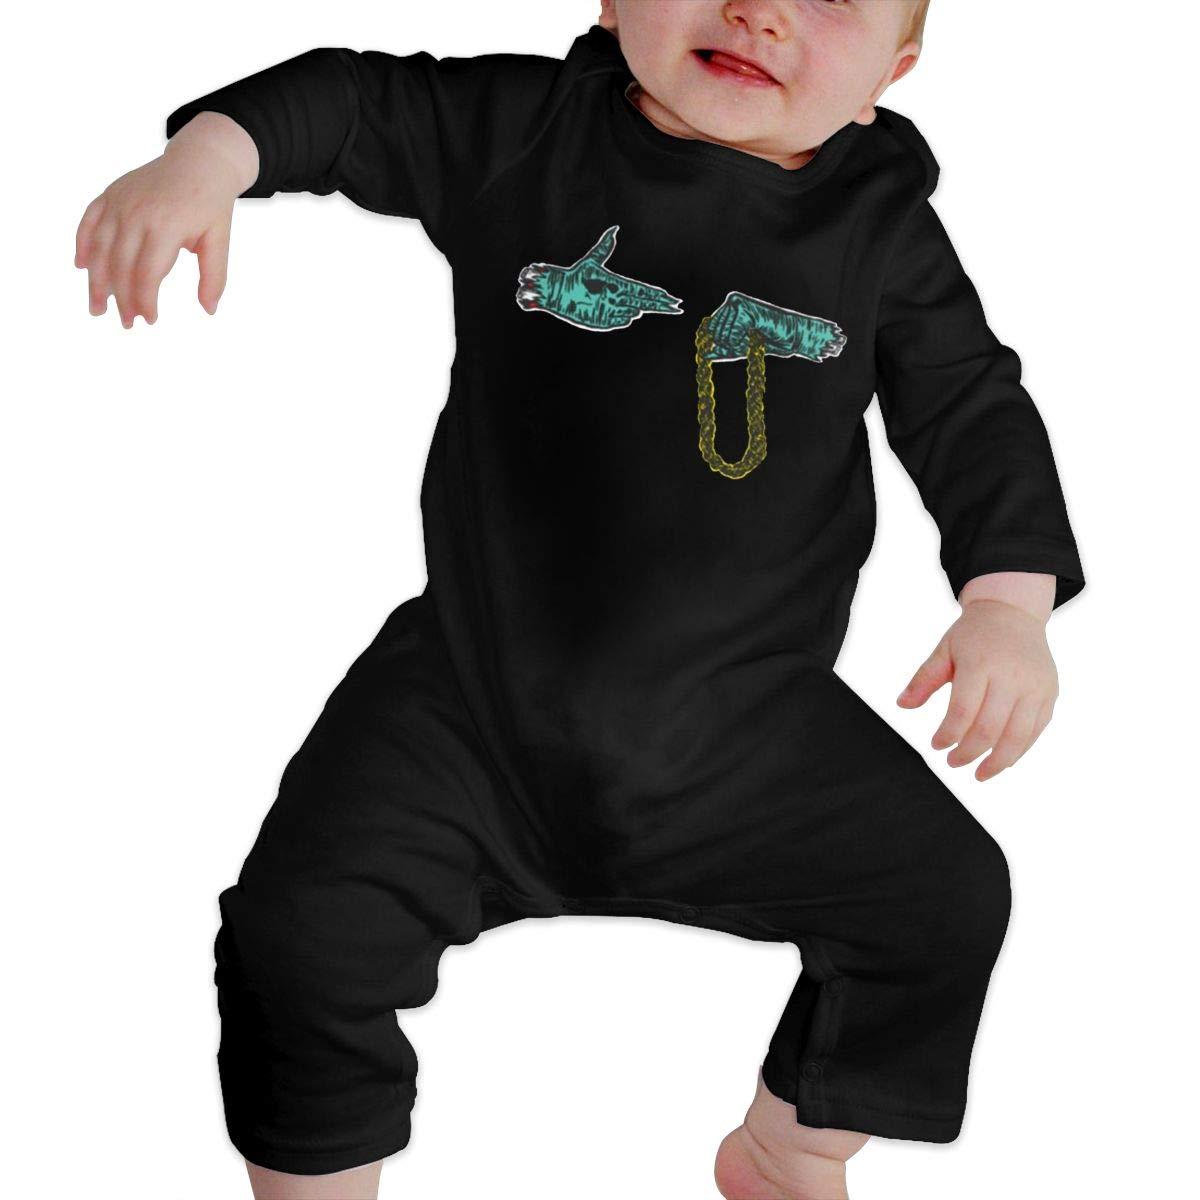 Fional Infant Long Sleeve Romper Vintage-Run Newborn Babys 0-24M Organic Cotton Jumpsuit Outfit